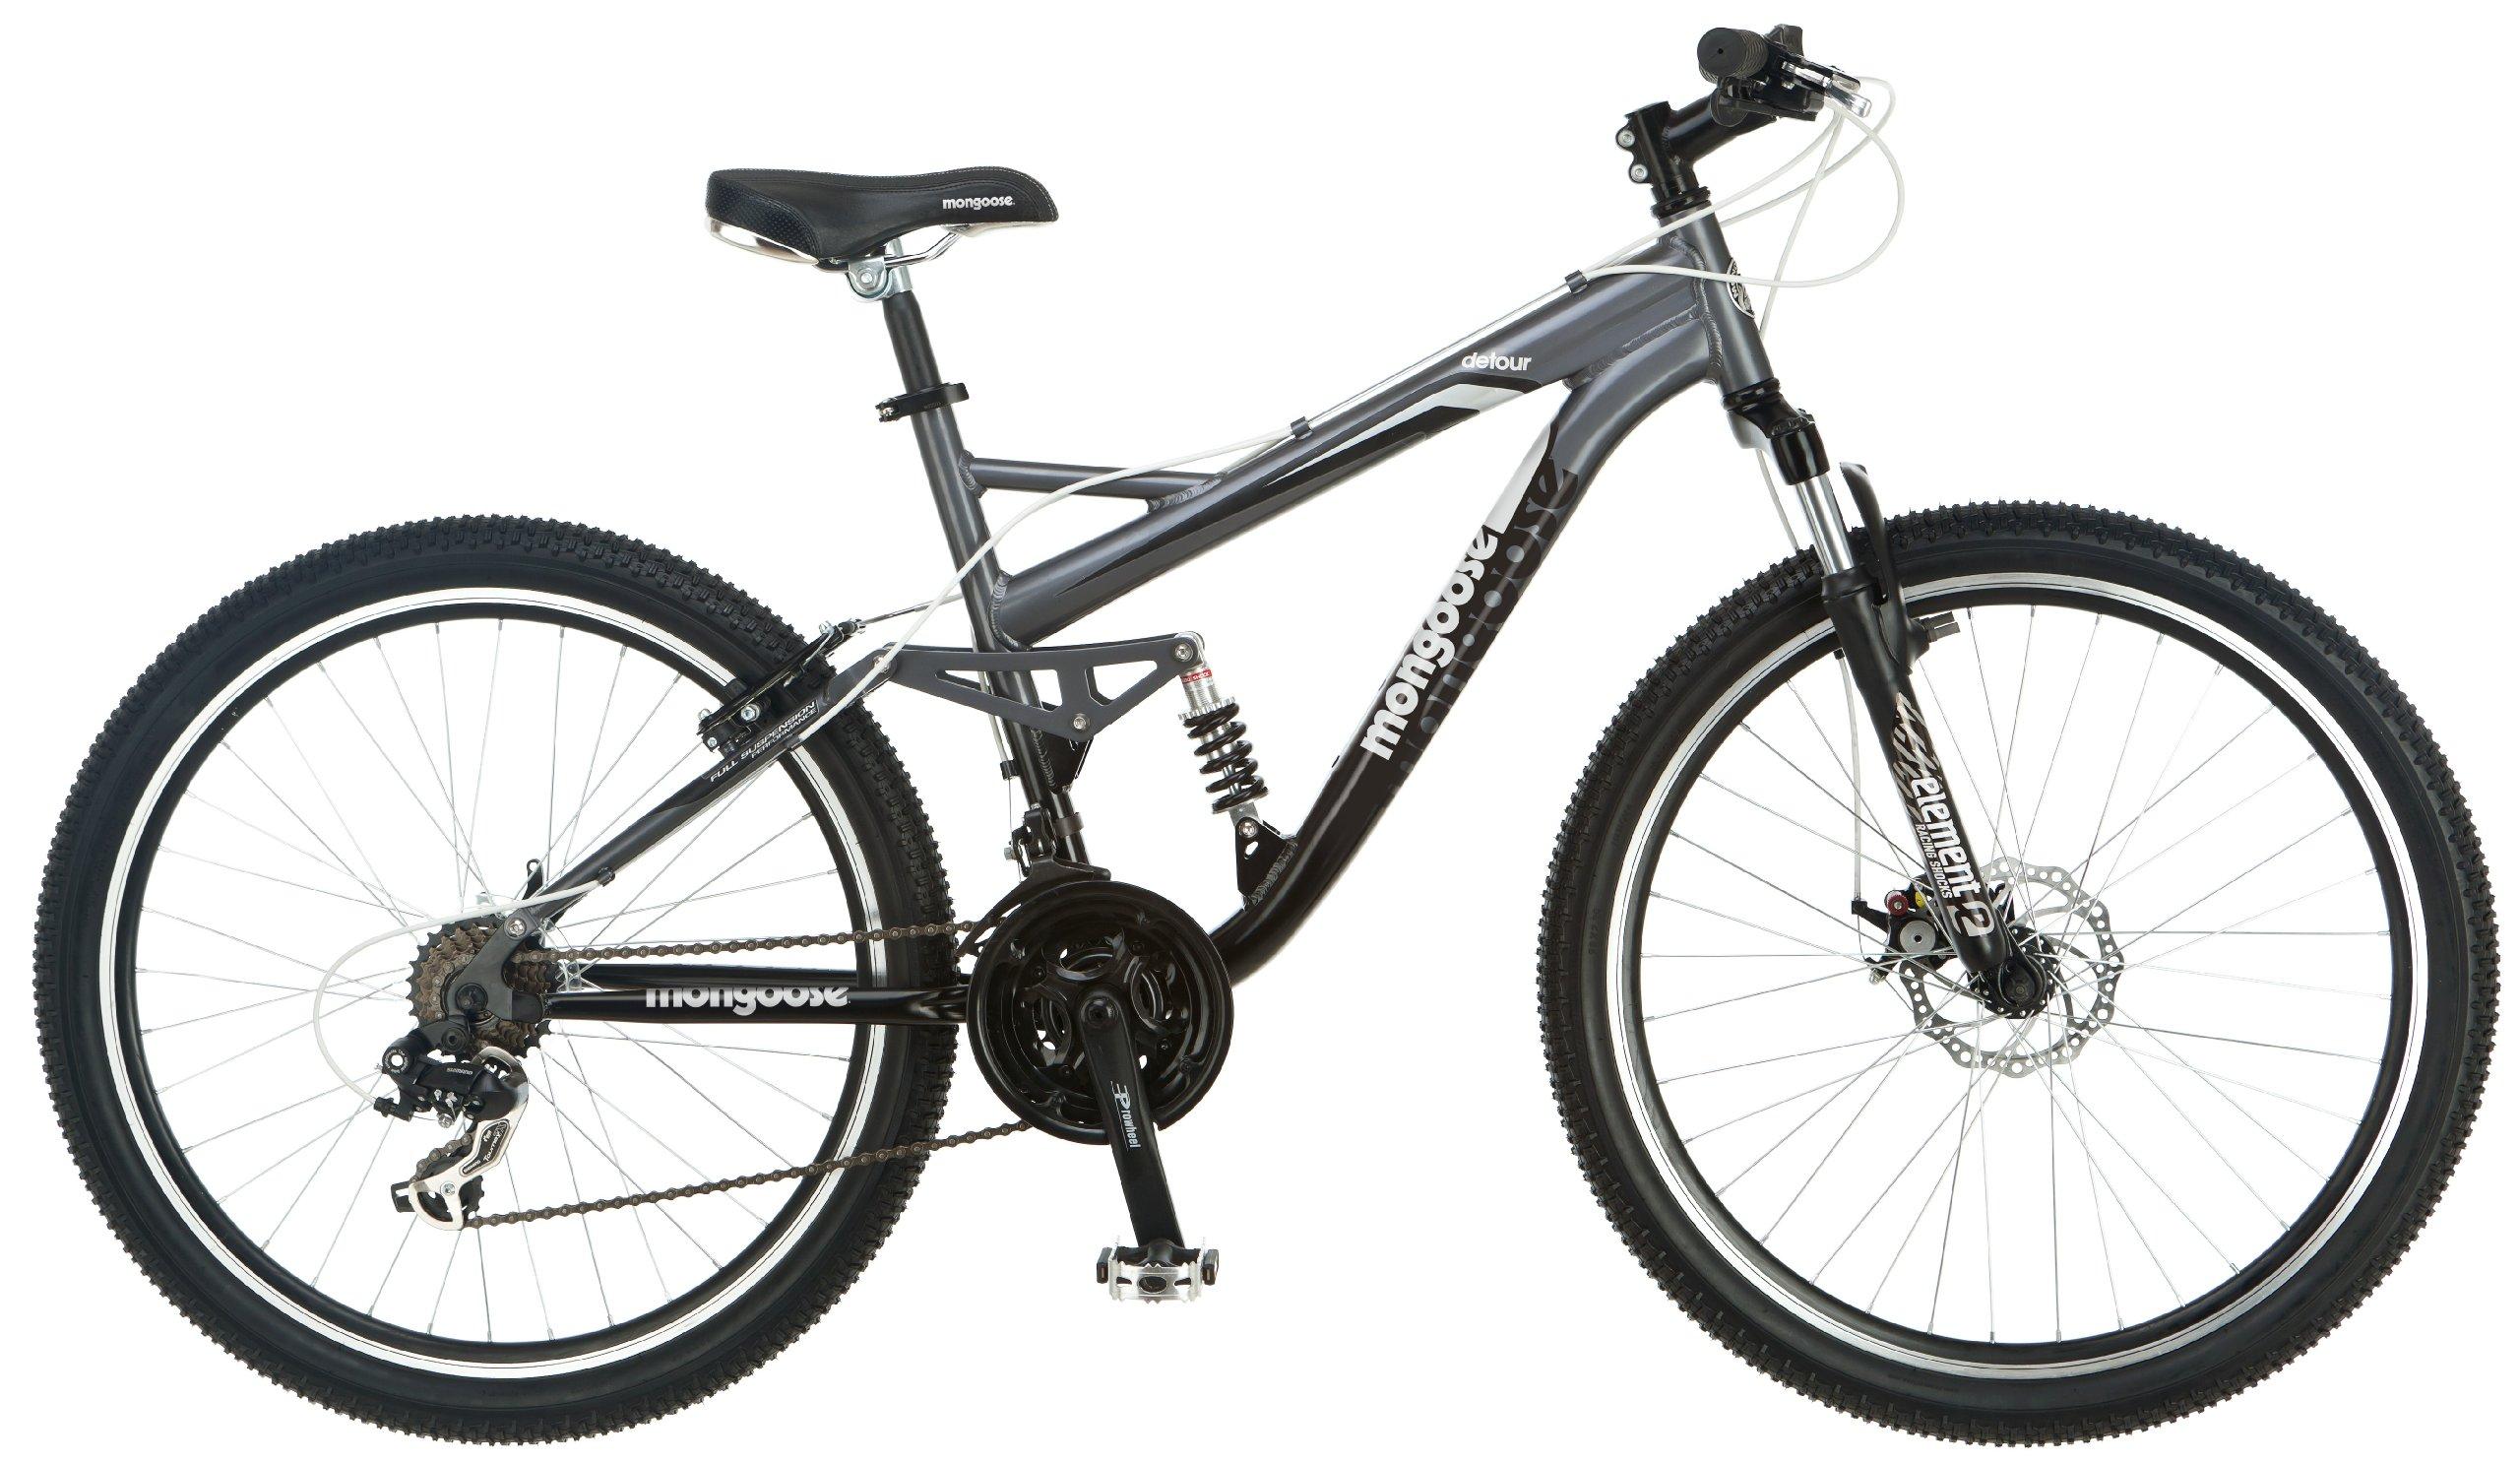 Mongoose Detour Full Suspension Bicycle (26-Inch)